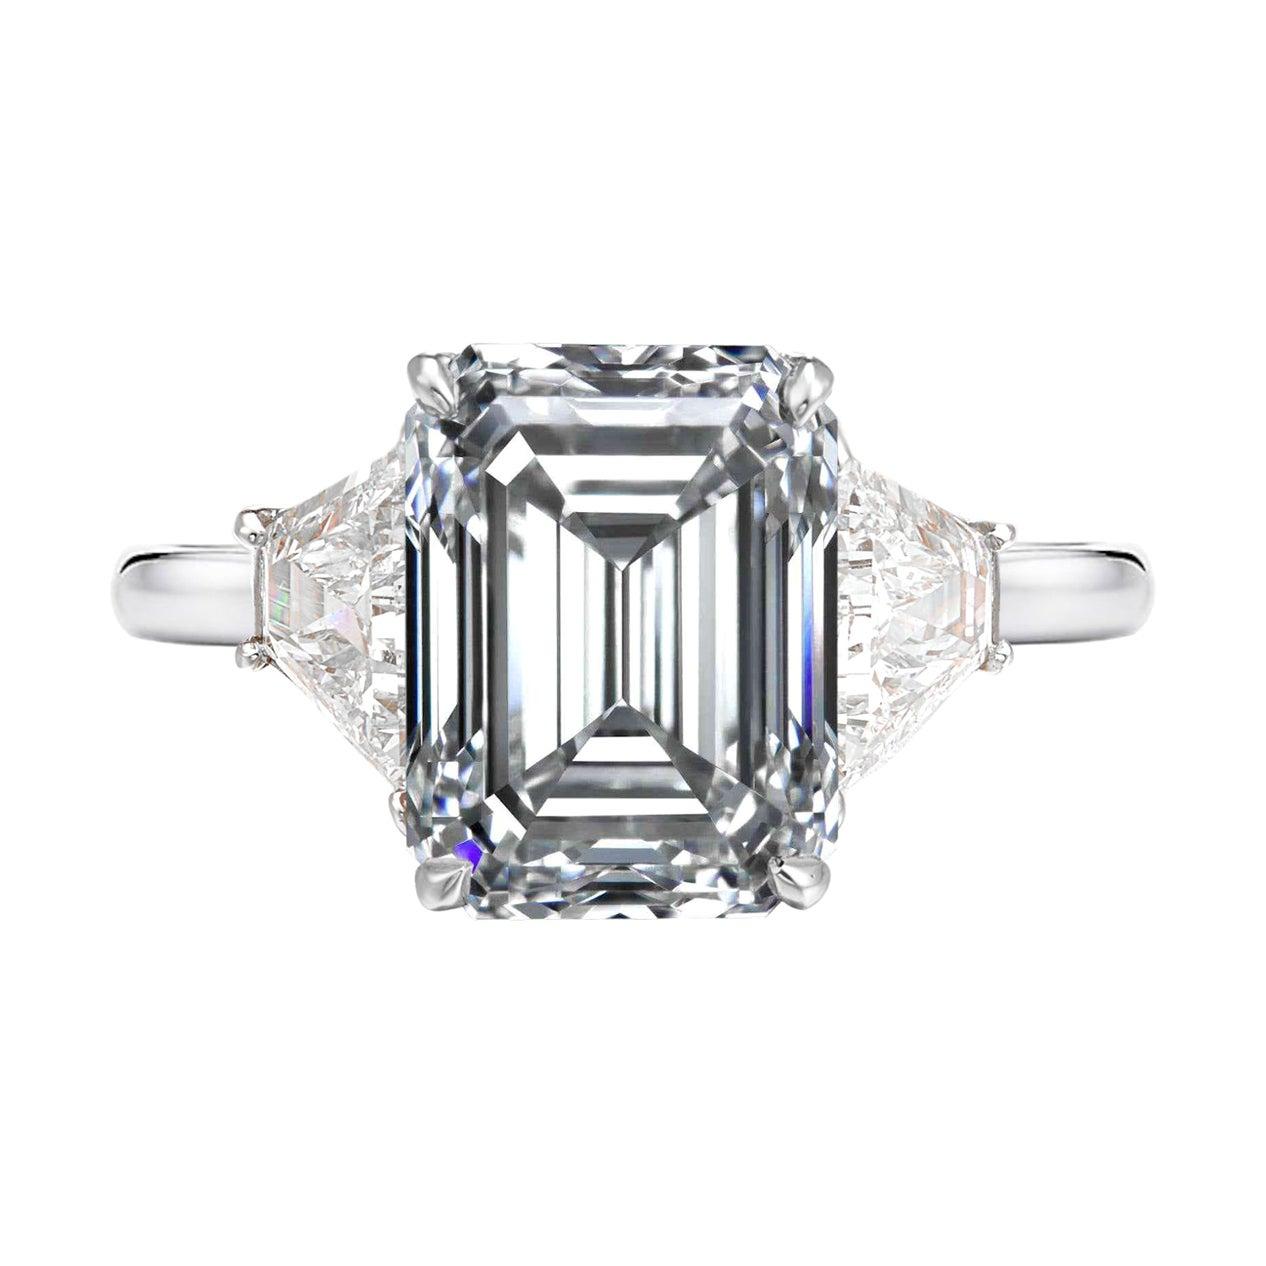 GIA Certified 2.55 Carat Emerald Cut Halfmoon Diamond Platinum Ring